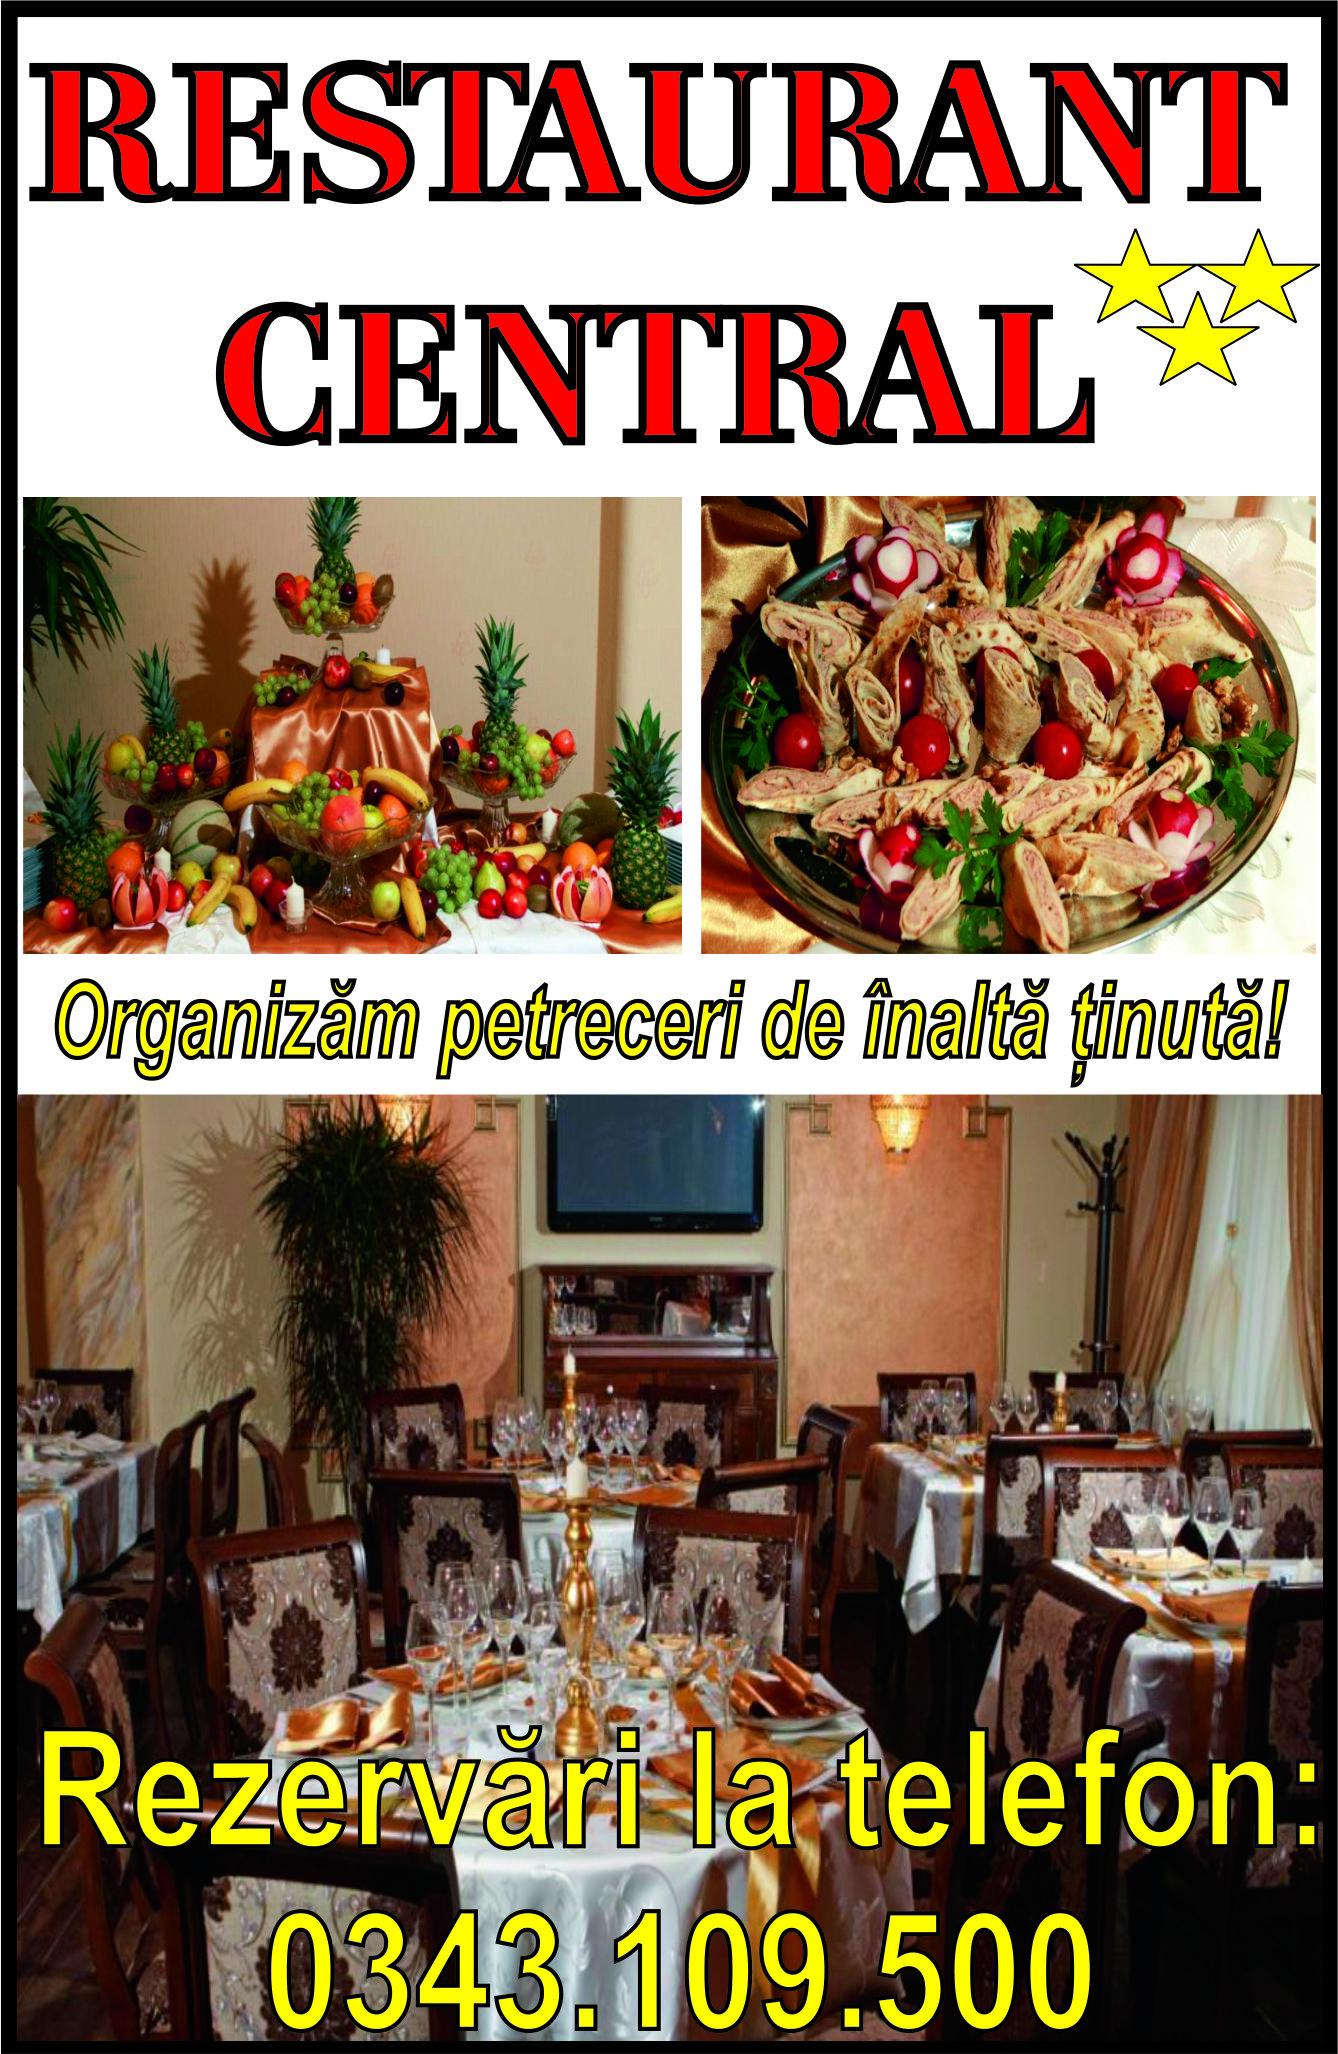 central-2.jpg